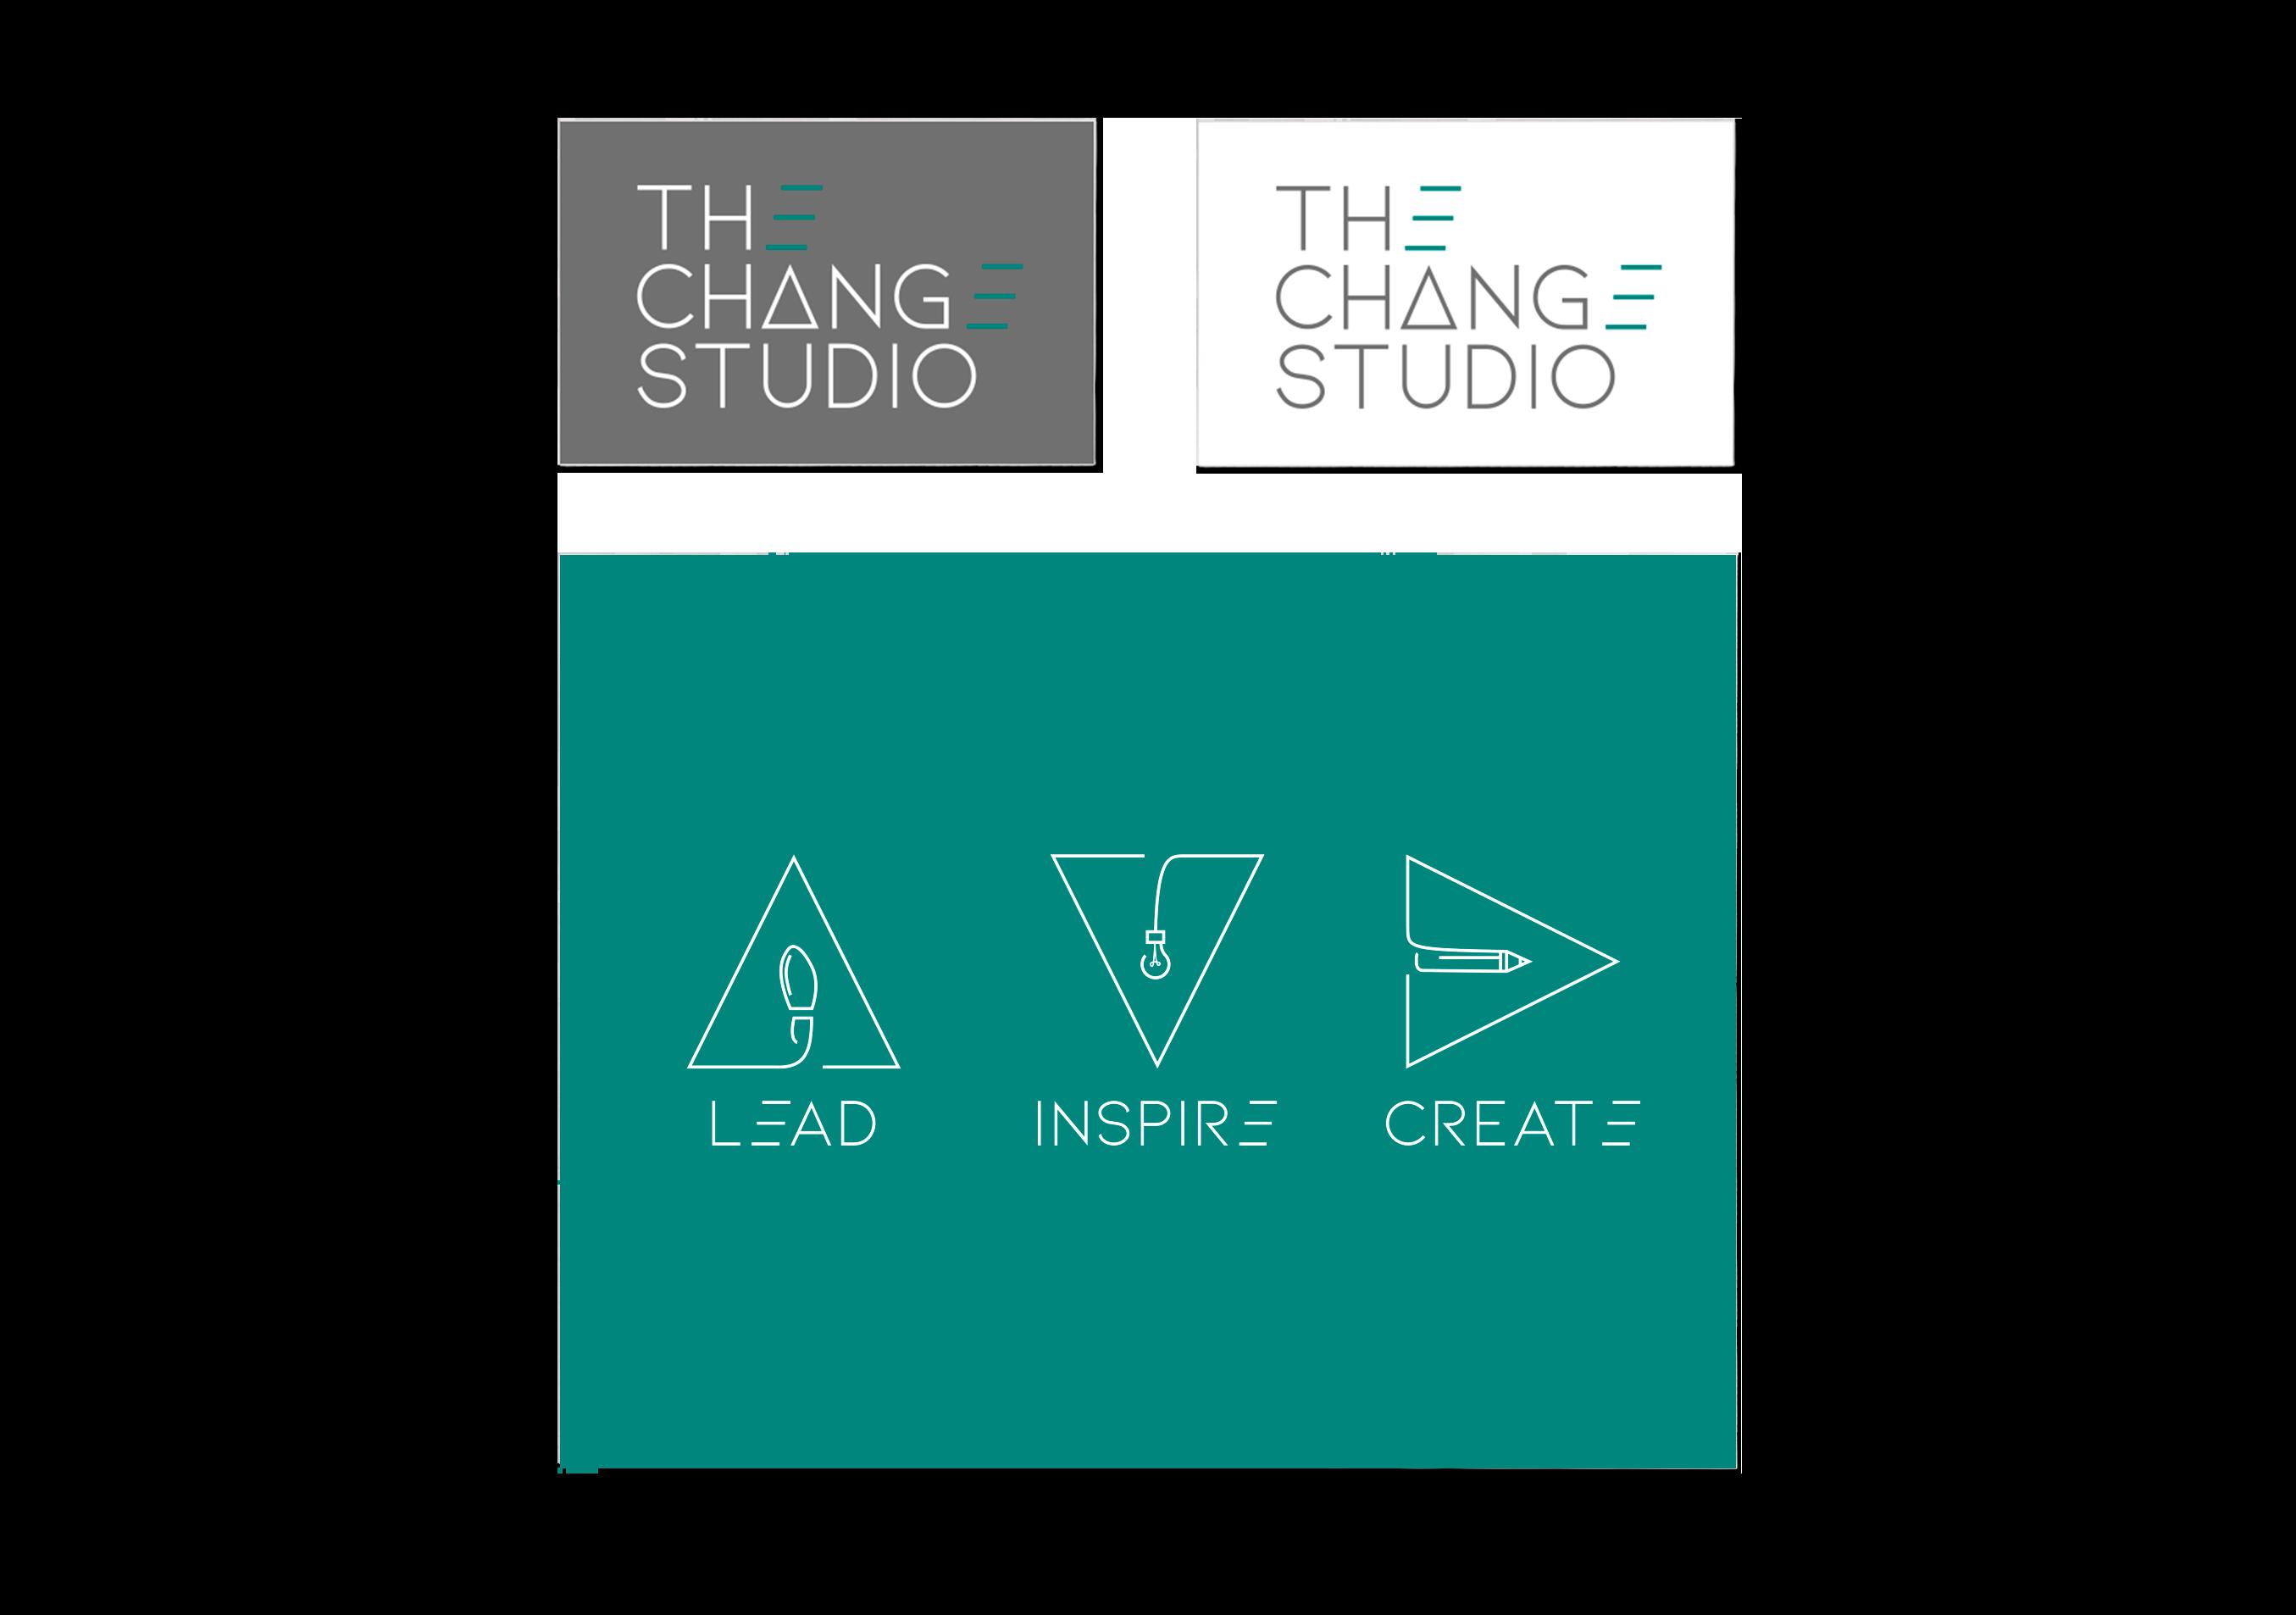 The Change Studio